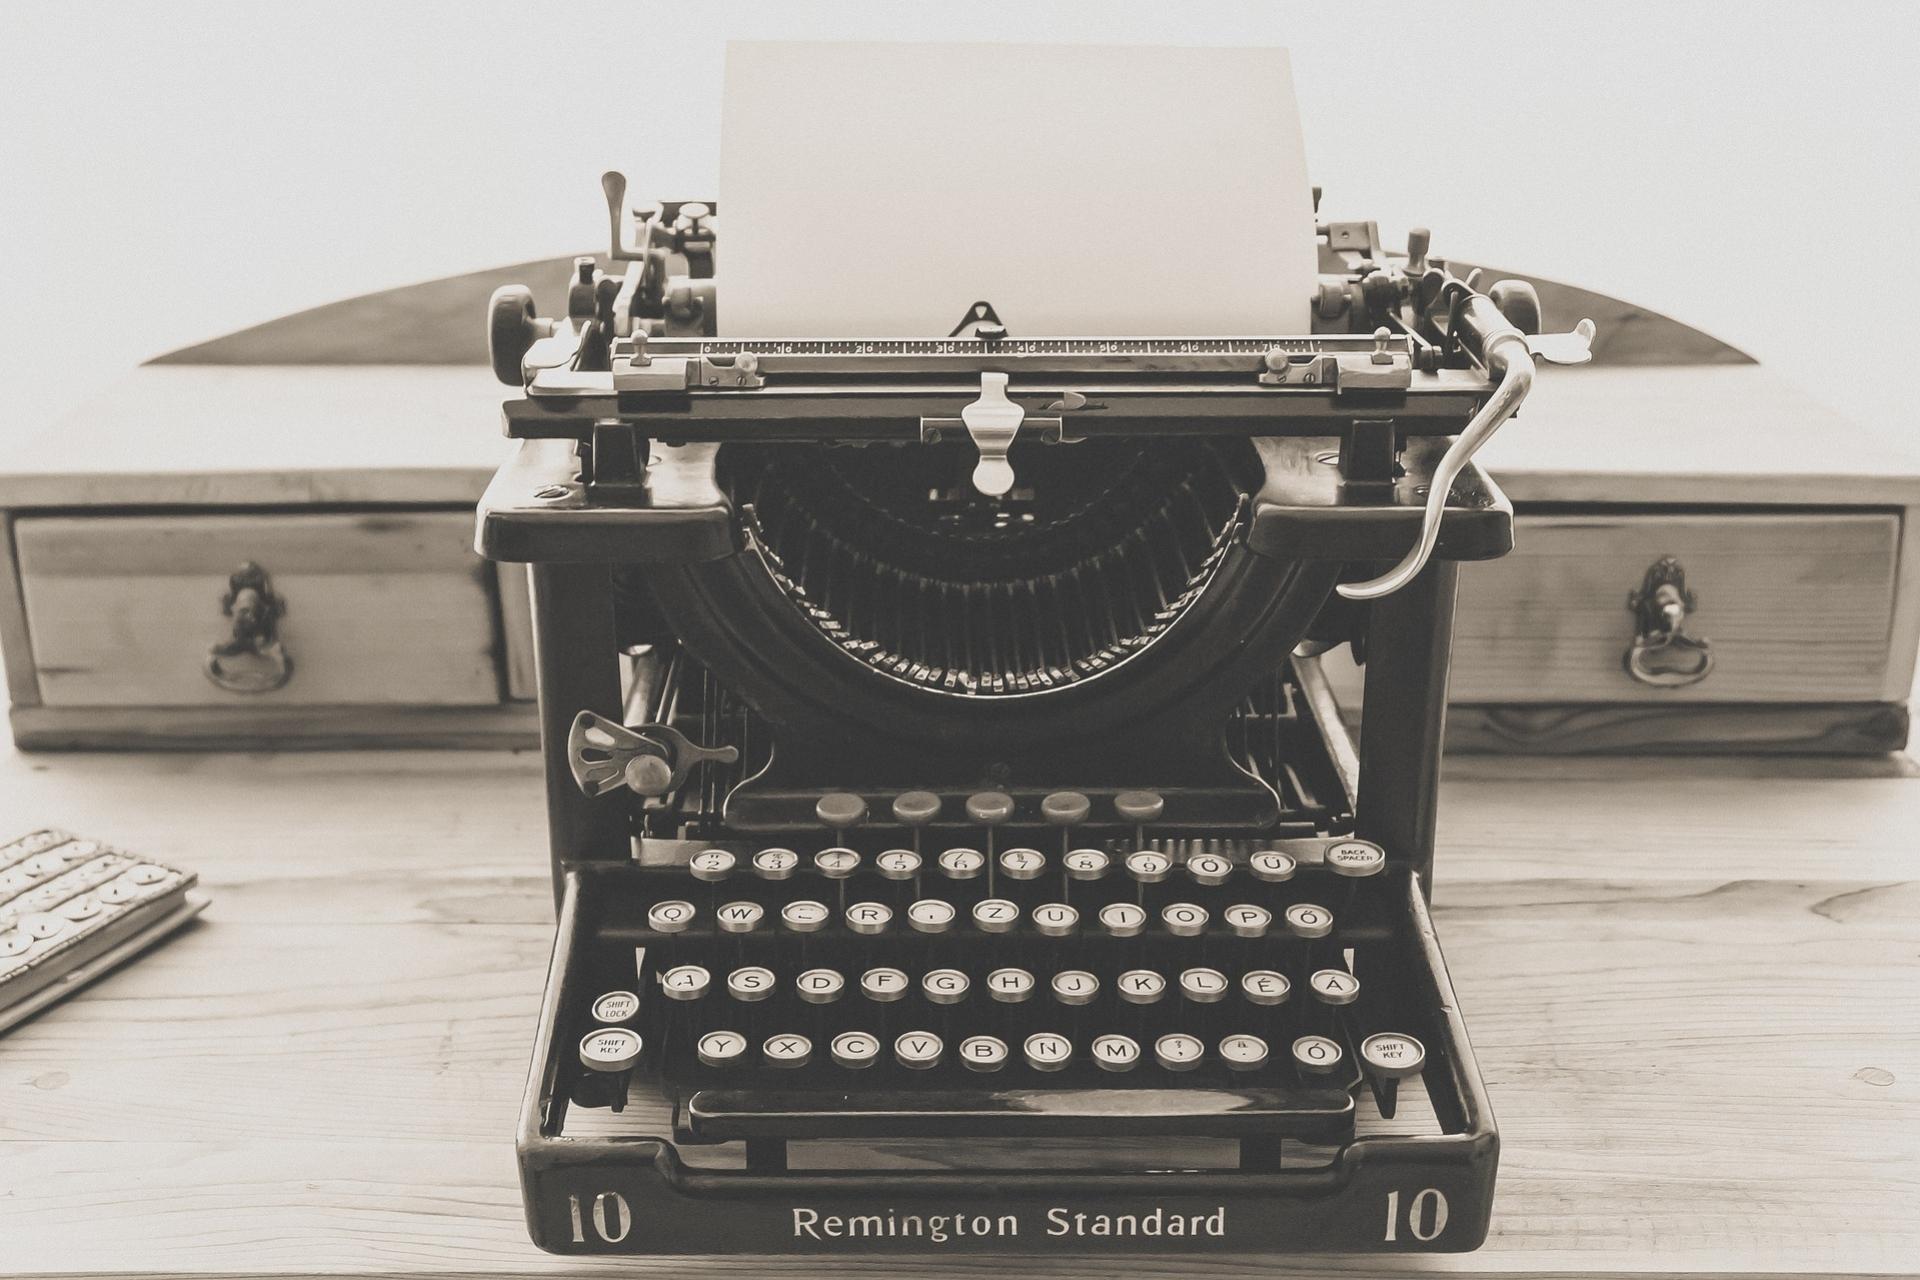 The LoveReading Very Short Story Award 2019